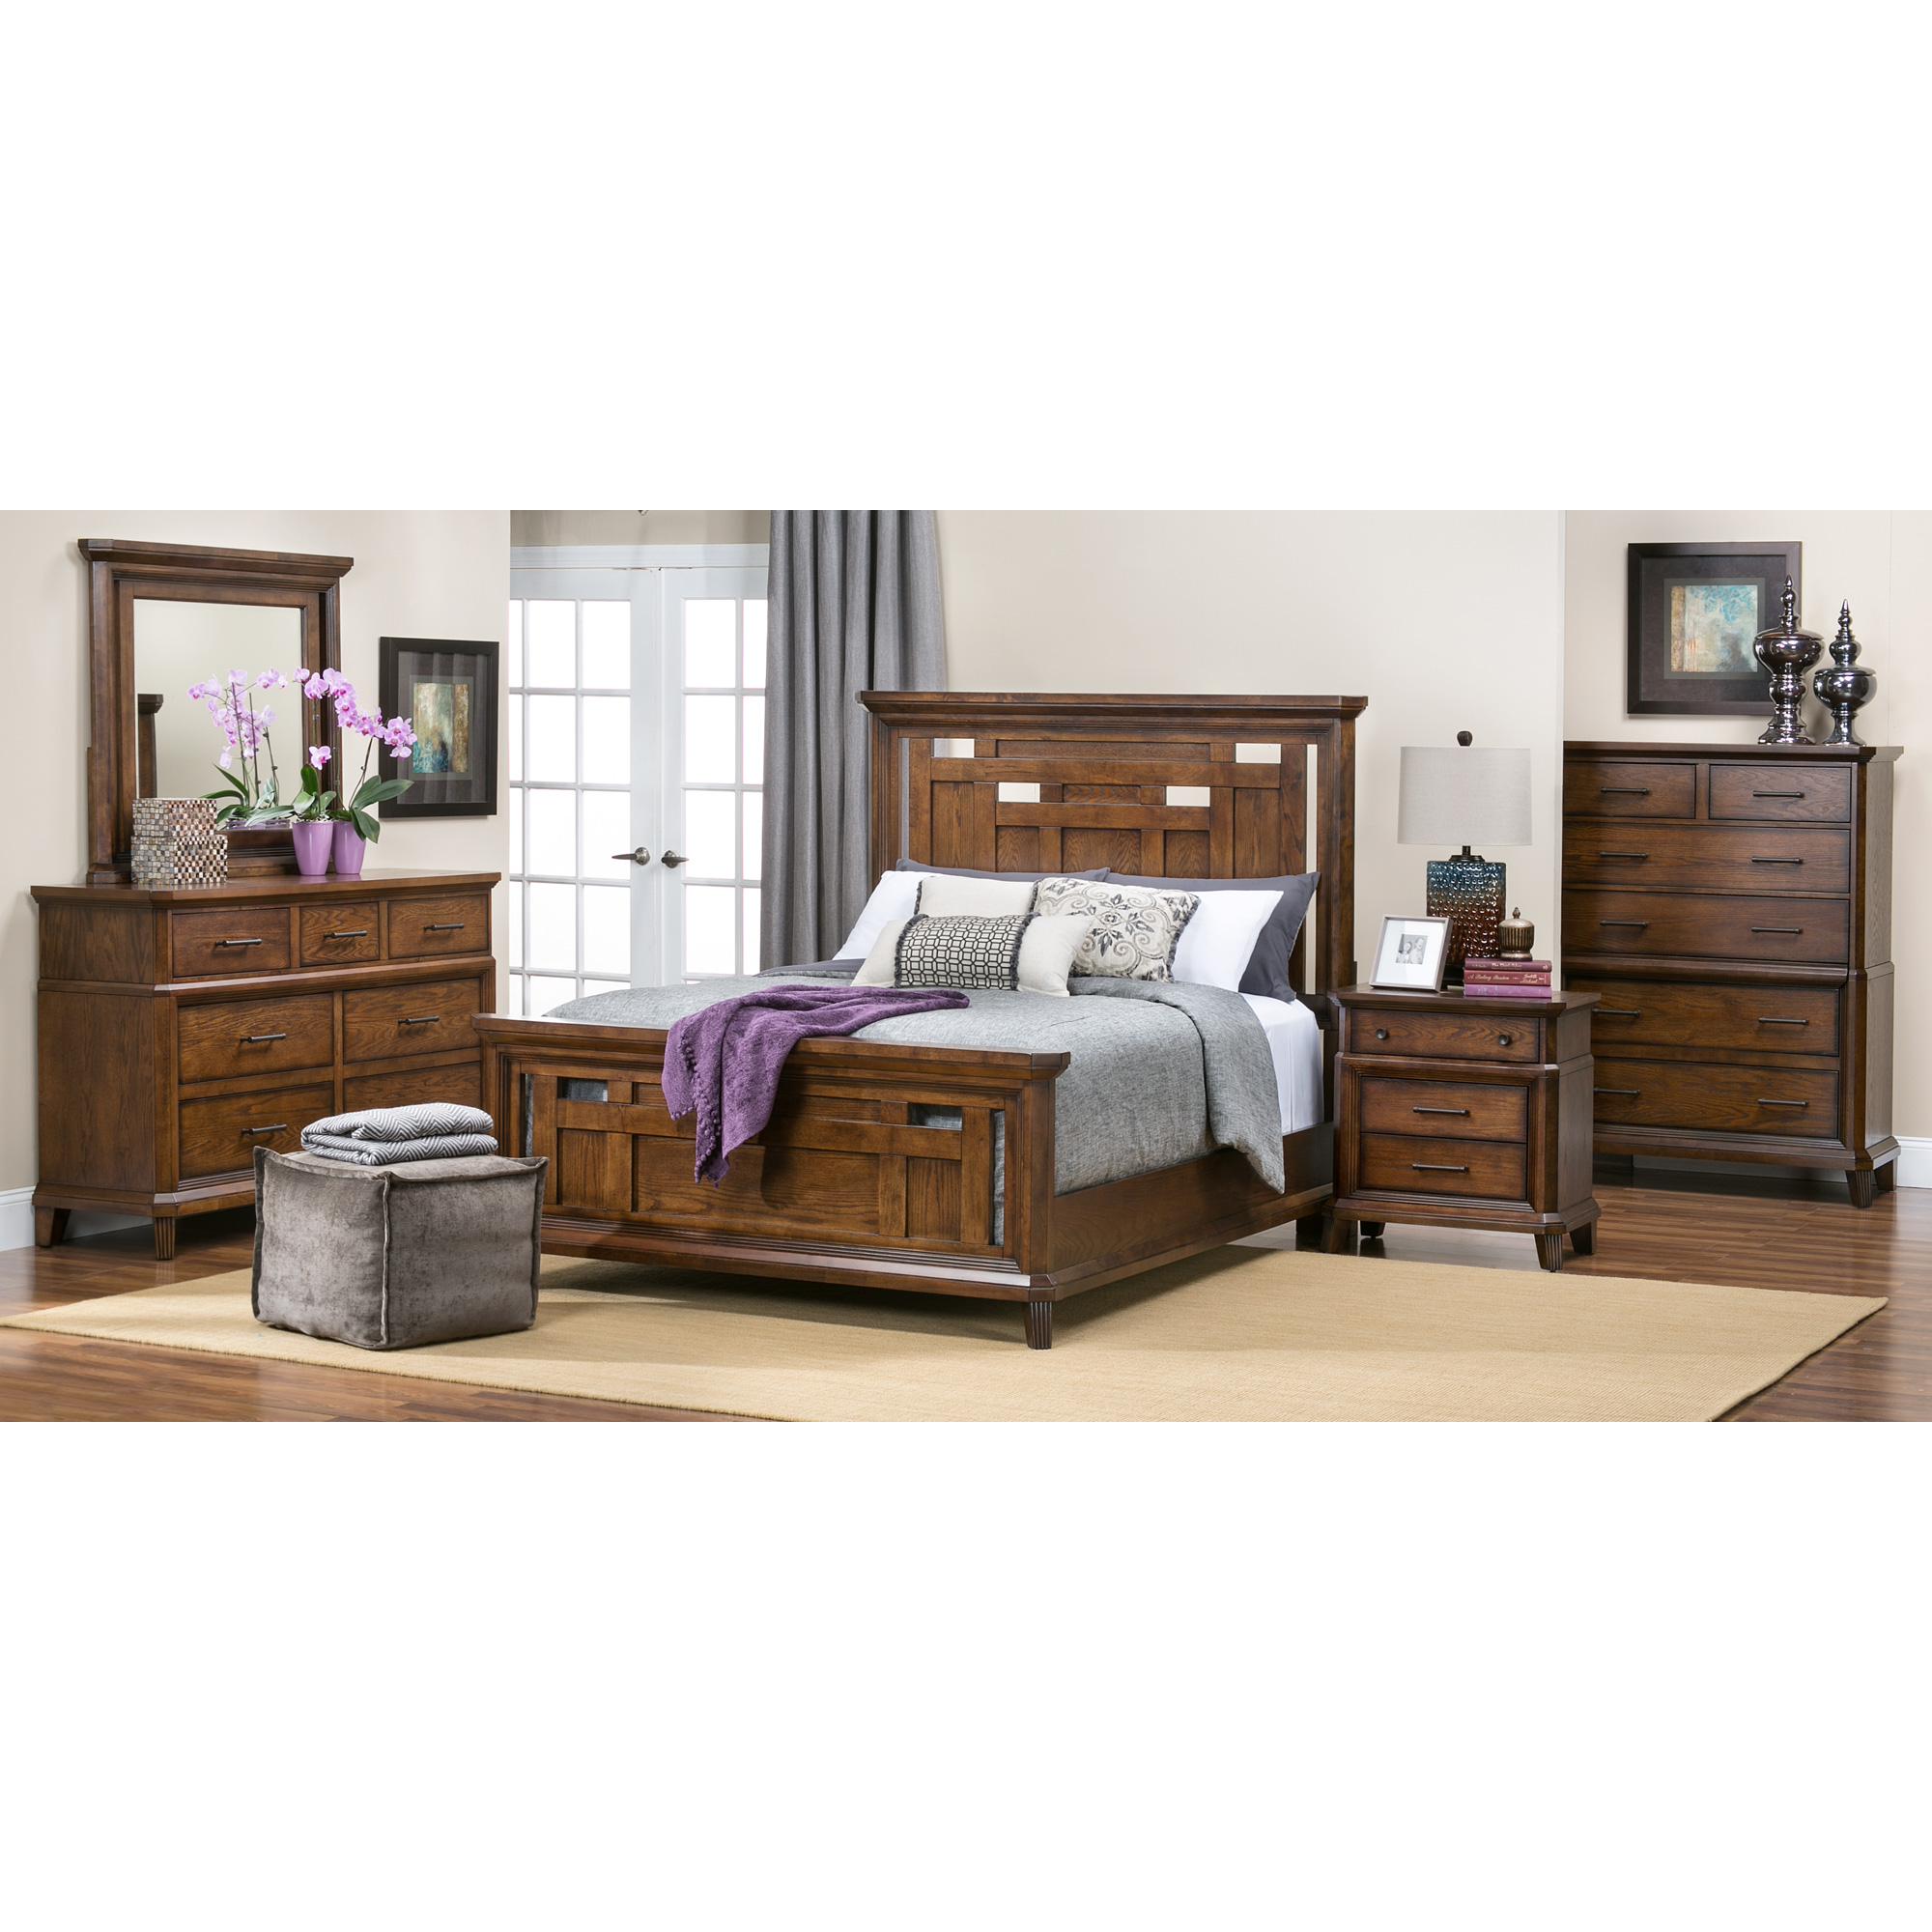 Davis Direct | Acorn Hill Brown King 4 Piece Room Group Bedroom Set